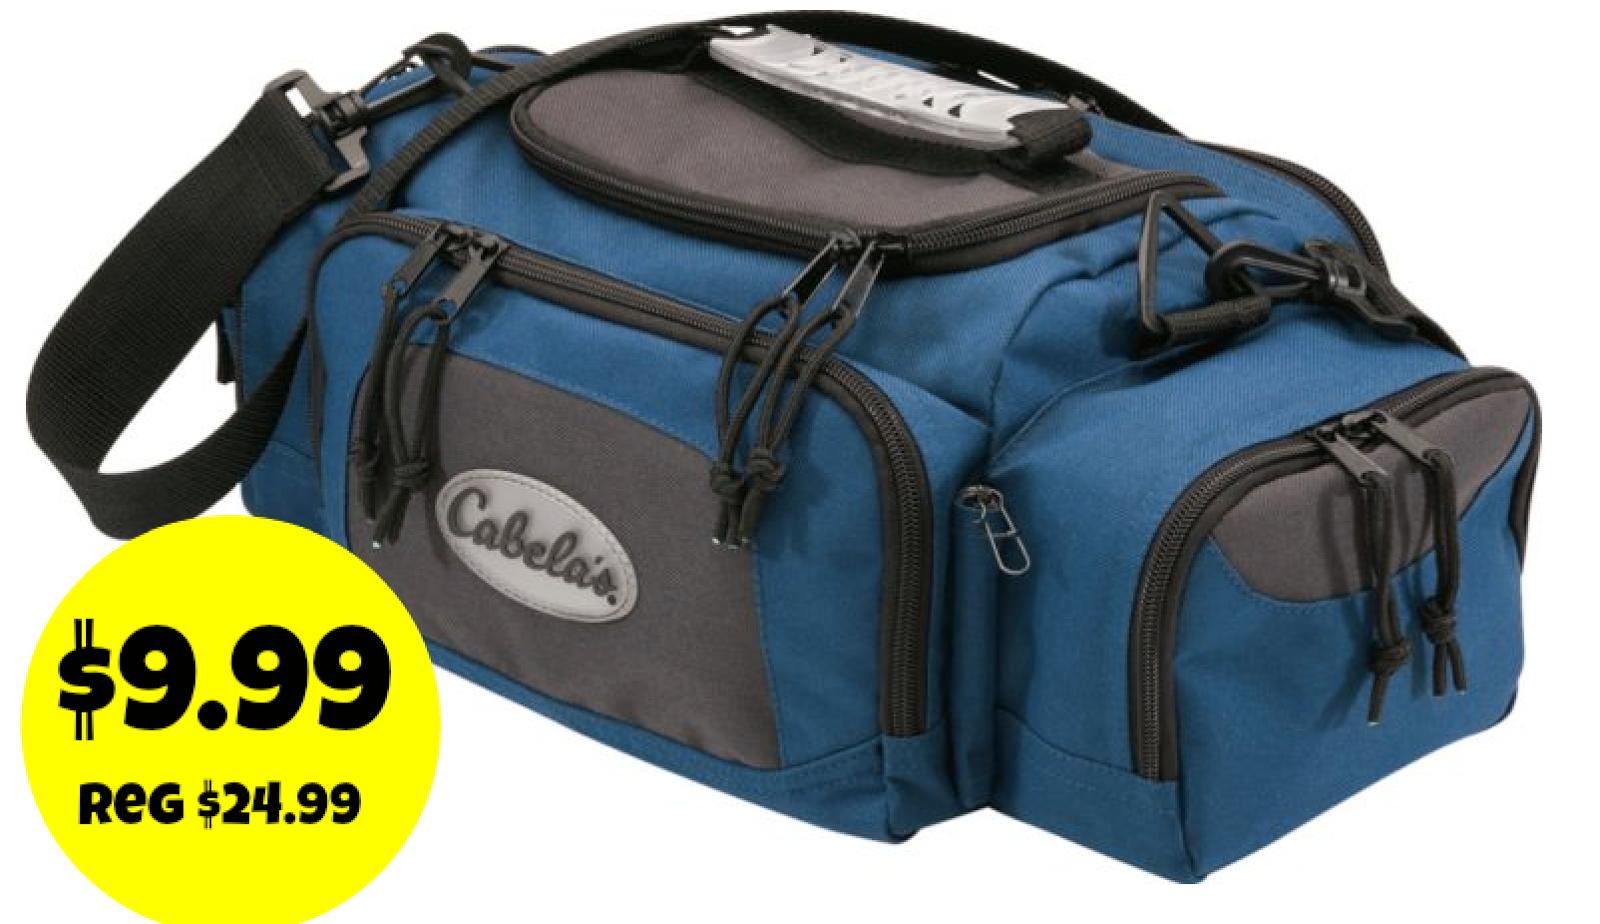 http://www.thebinderladies.com/2015/03/cabelas-fishing-utility-bag-999.html#.VPdcVELduyM